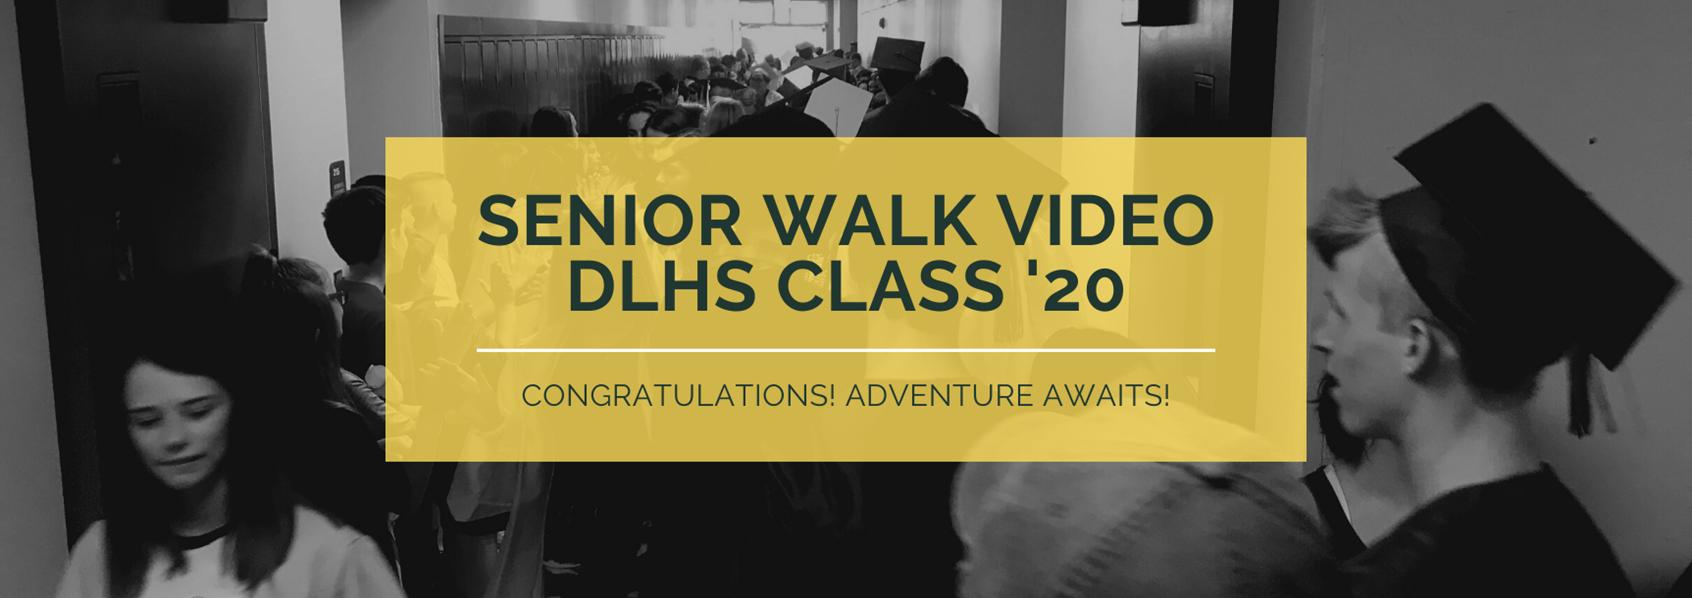 Senior Walk Video